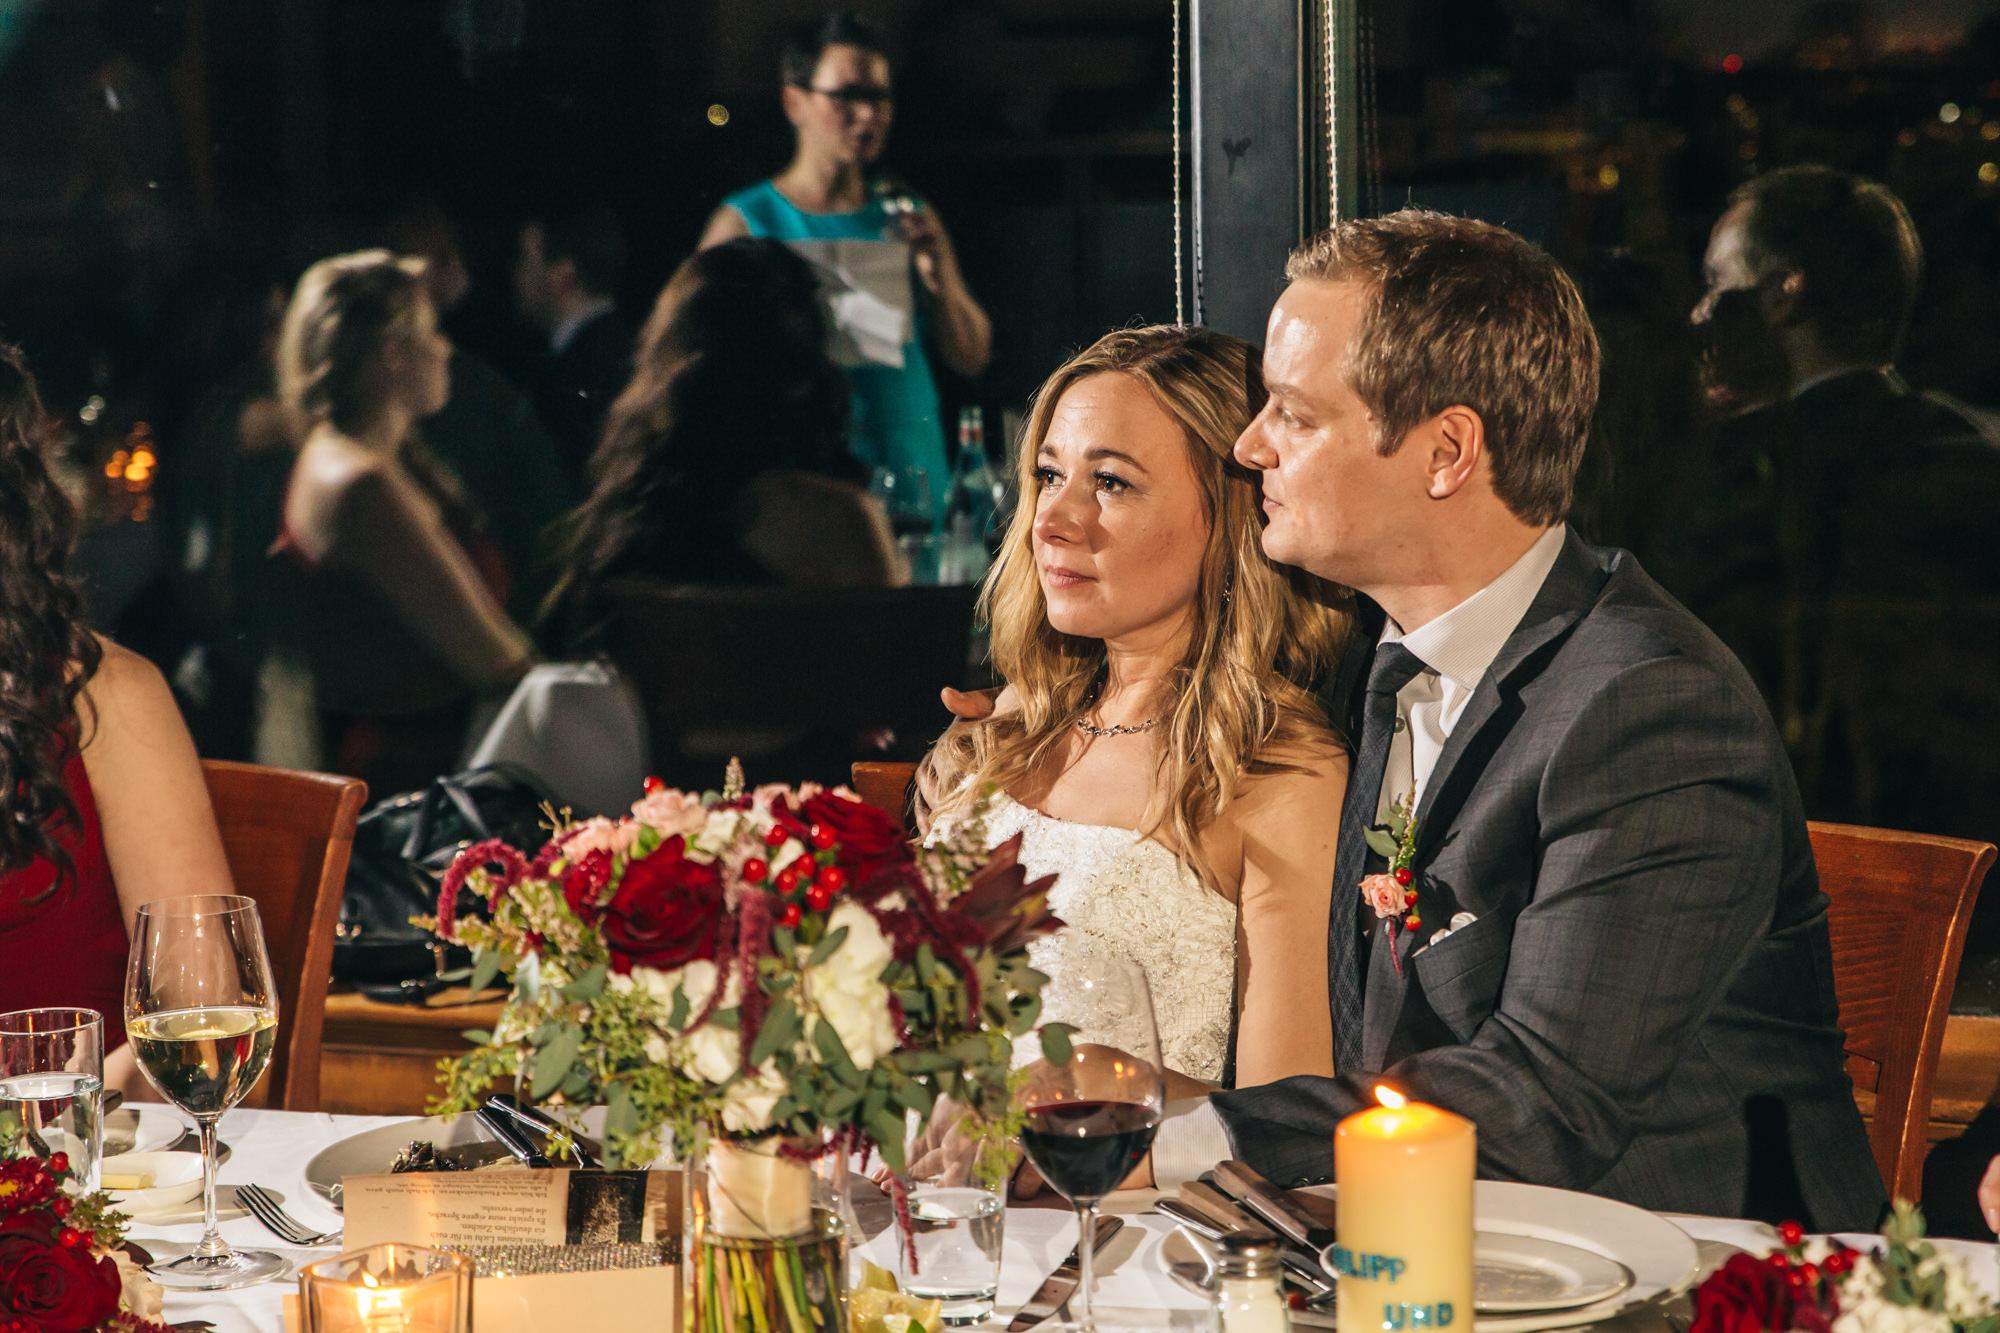 62-seasons-in-the-park-wedding-reception.jpg